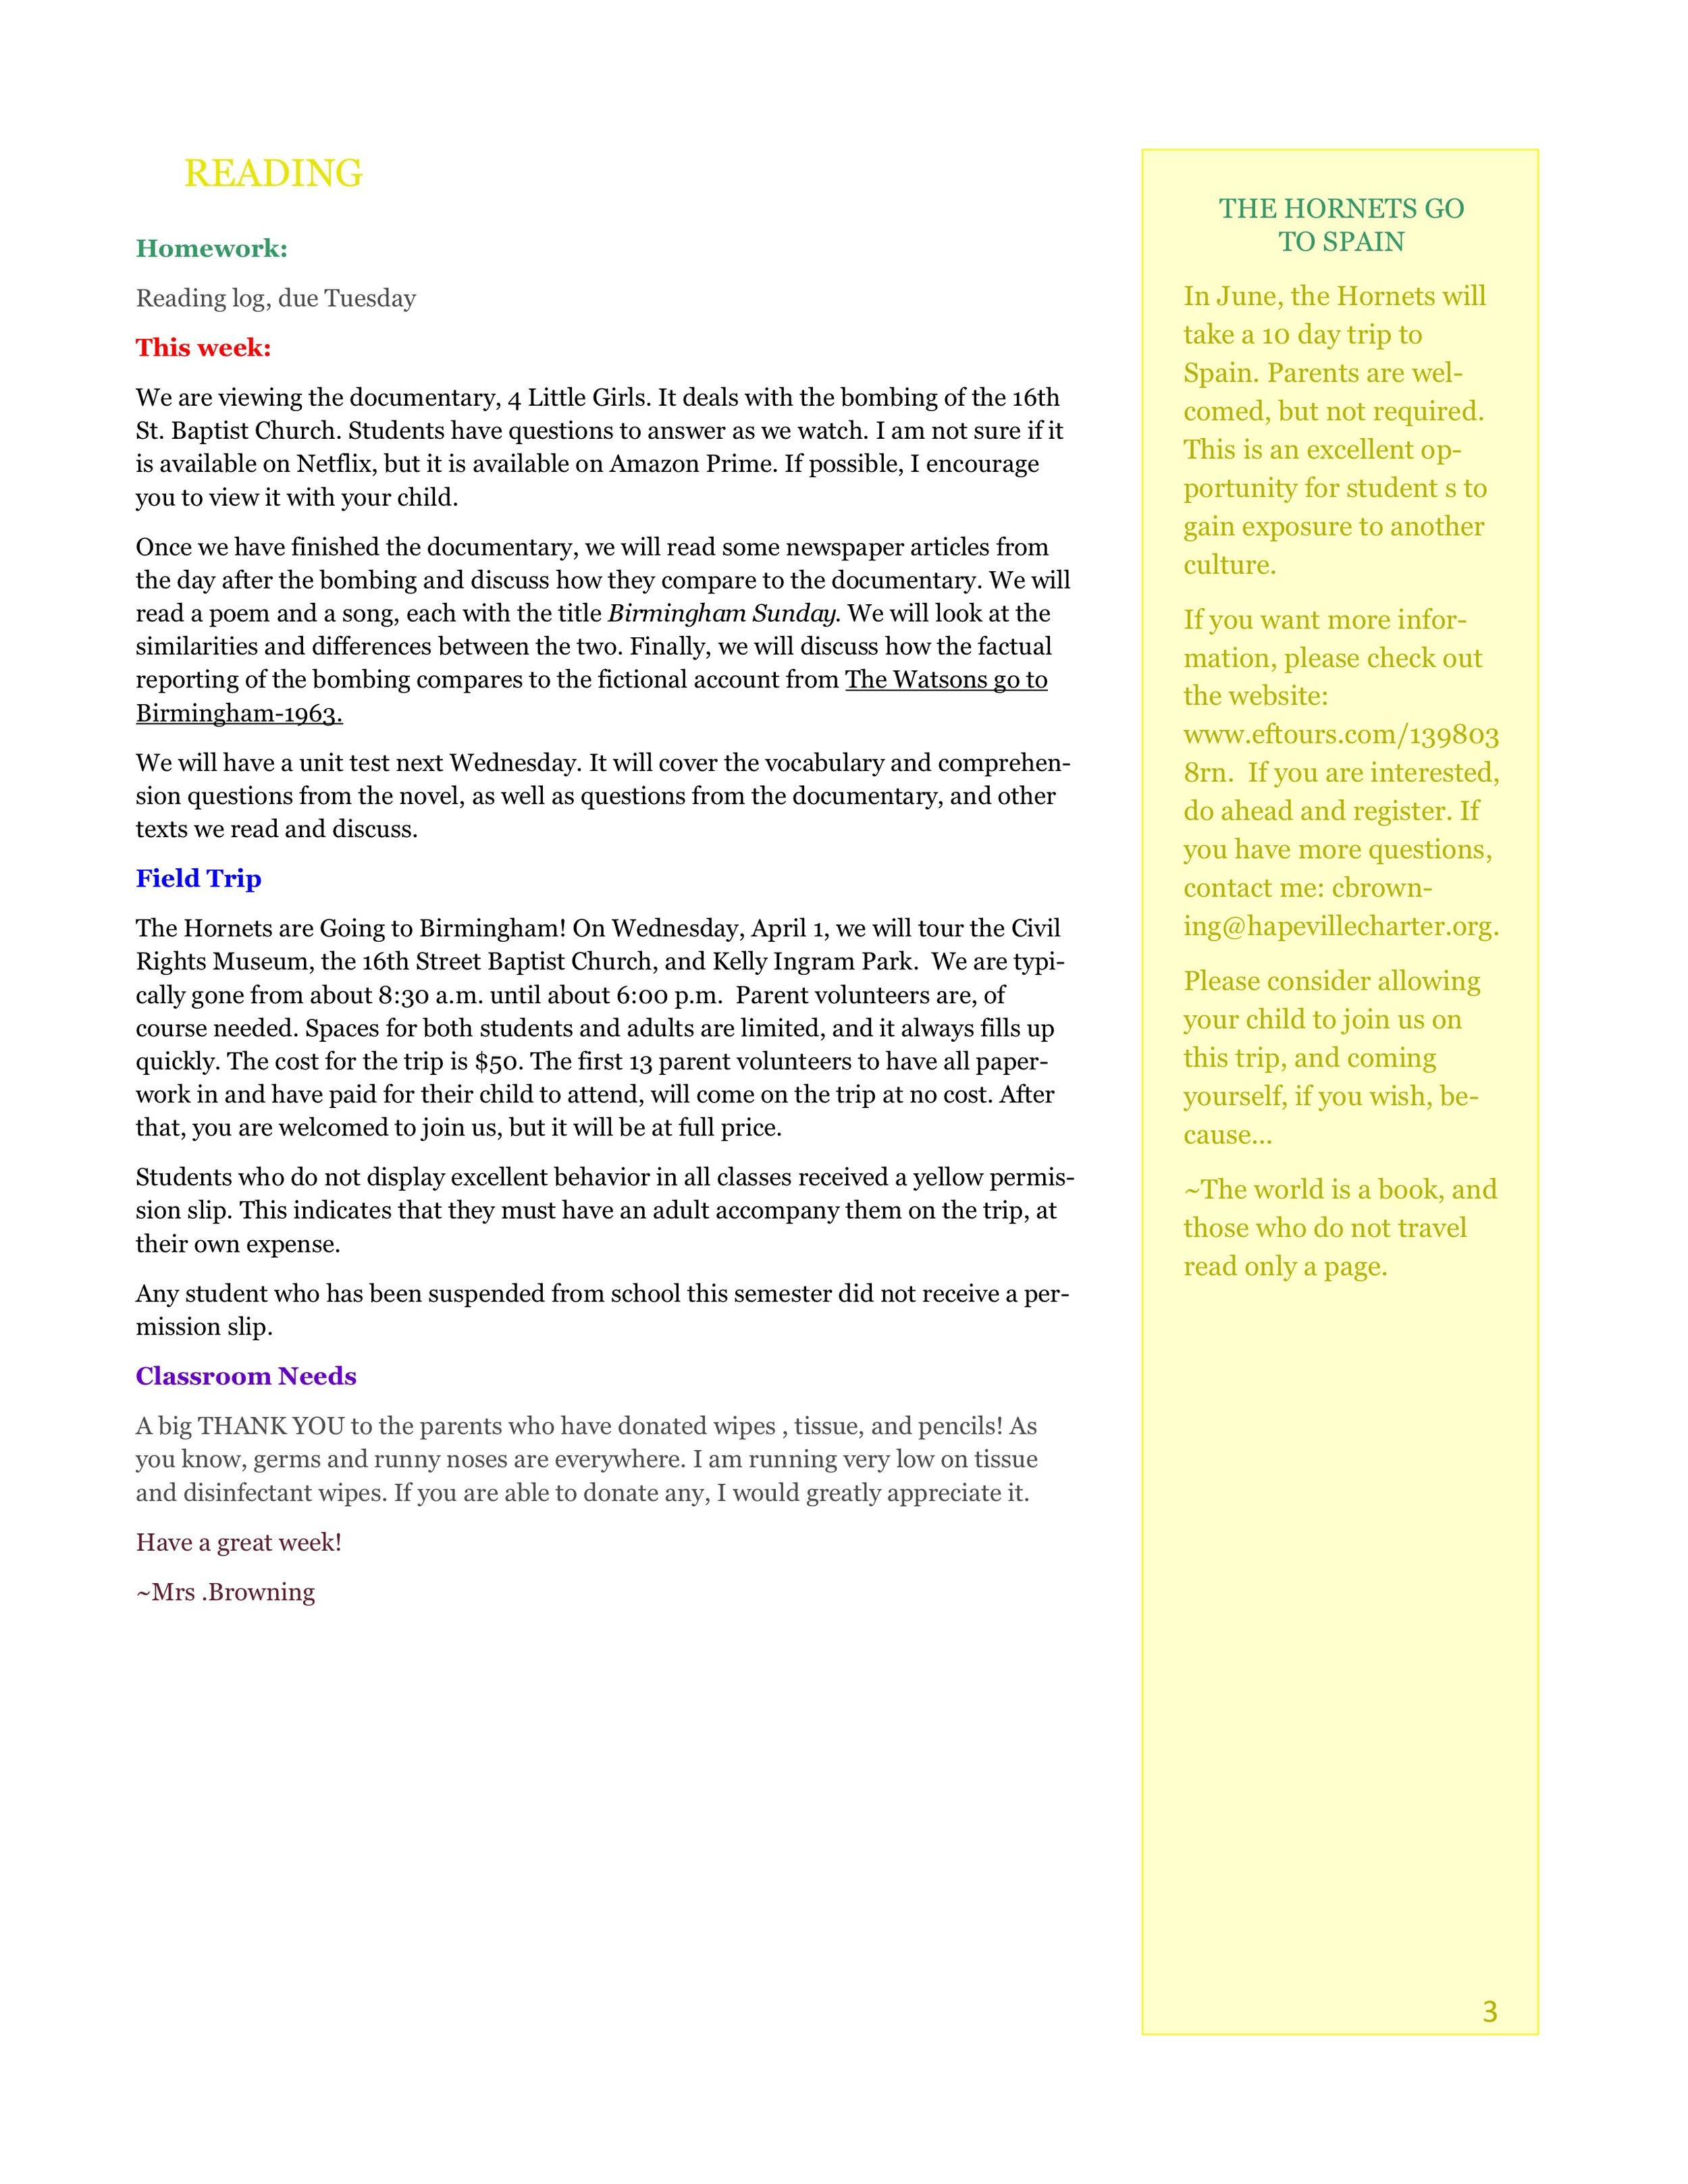 Newsletter ImageFebruary 9-13 3.jpeg